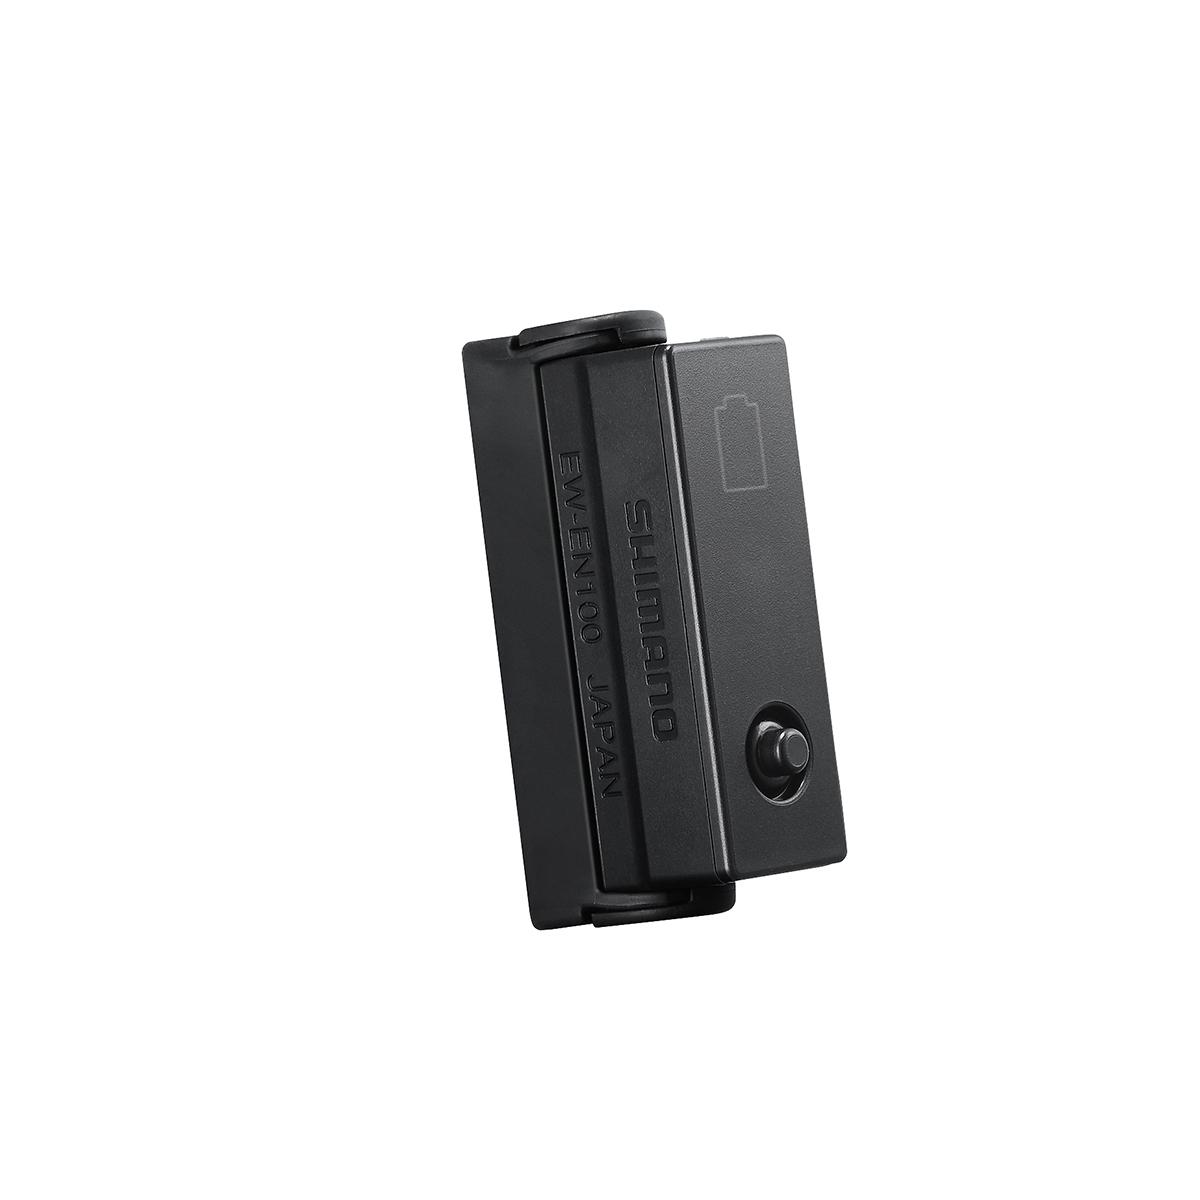 Adattatore ANT+ / Bluetooth Giunzione-A STEPS EW-EN100 E-Tube 2 Porte